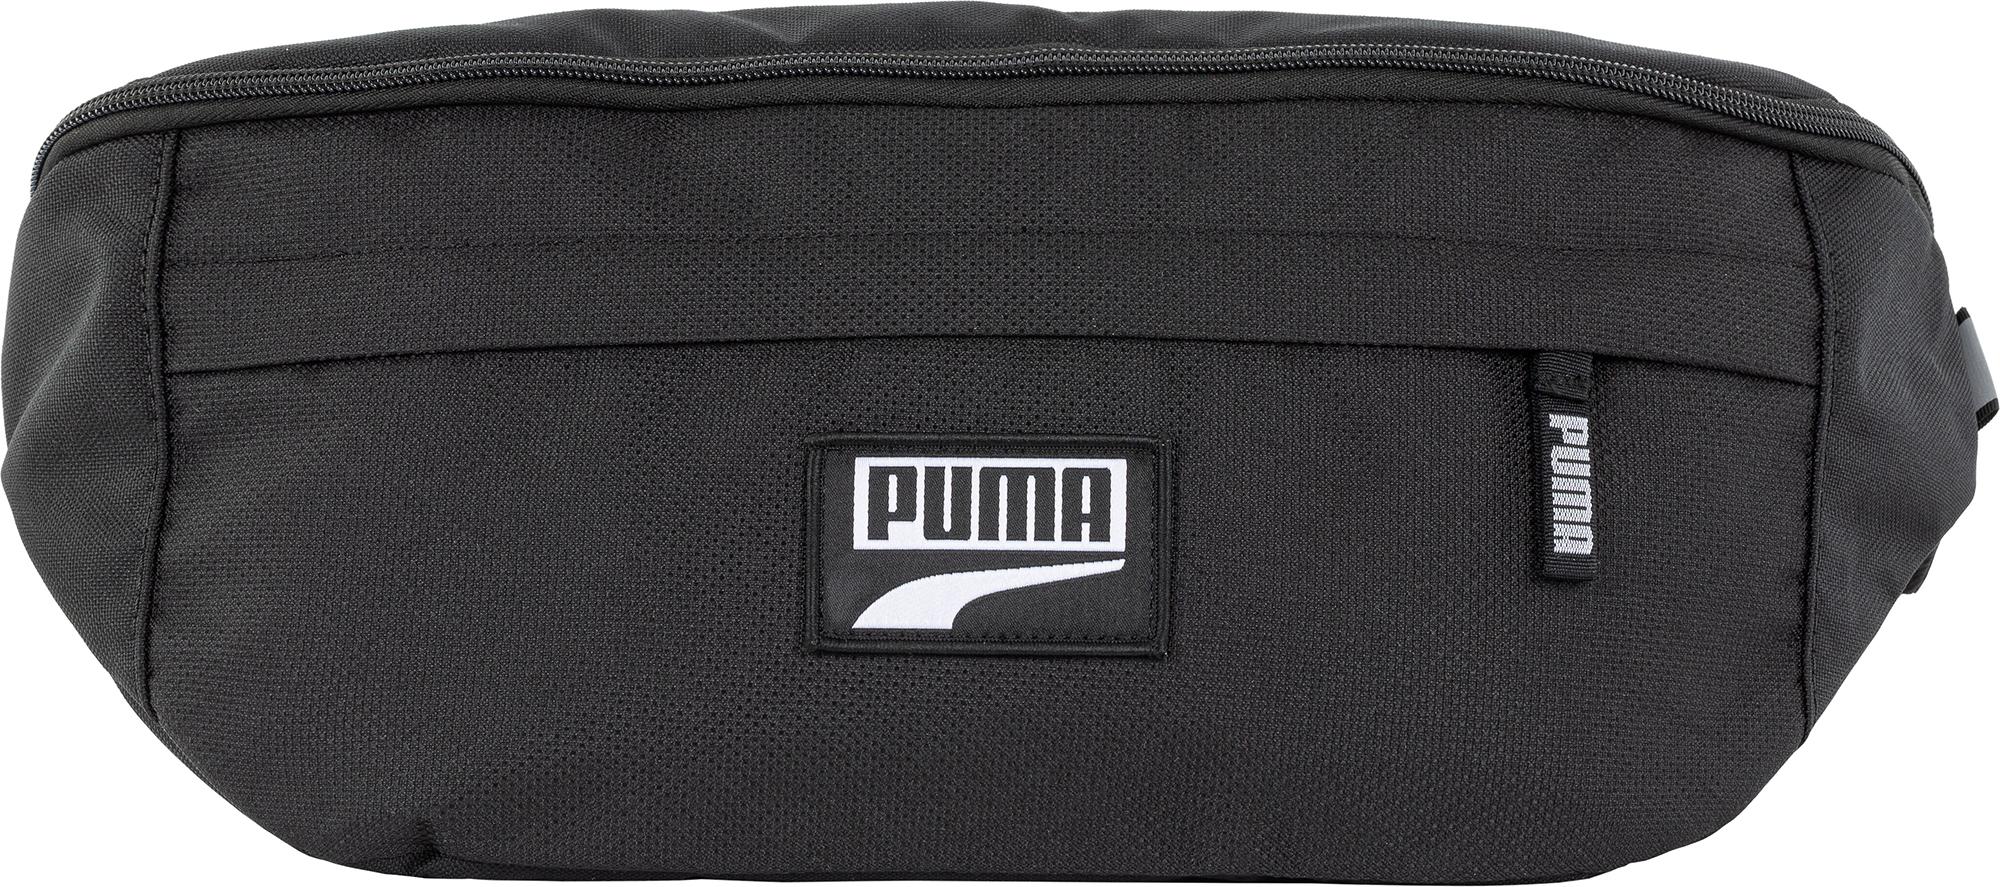 Puma Сумка Puma Deck Waist Bag XL сумка спортивная puma puma pu053bucjhx0